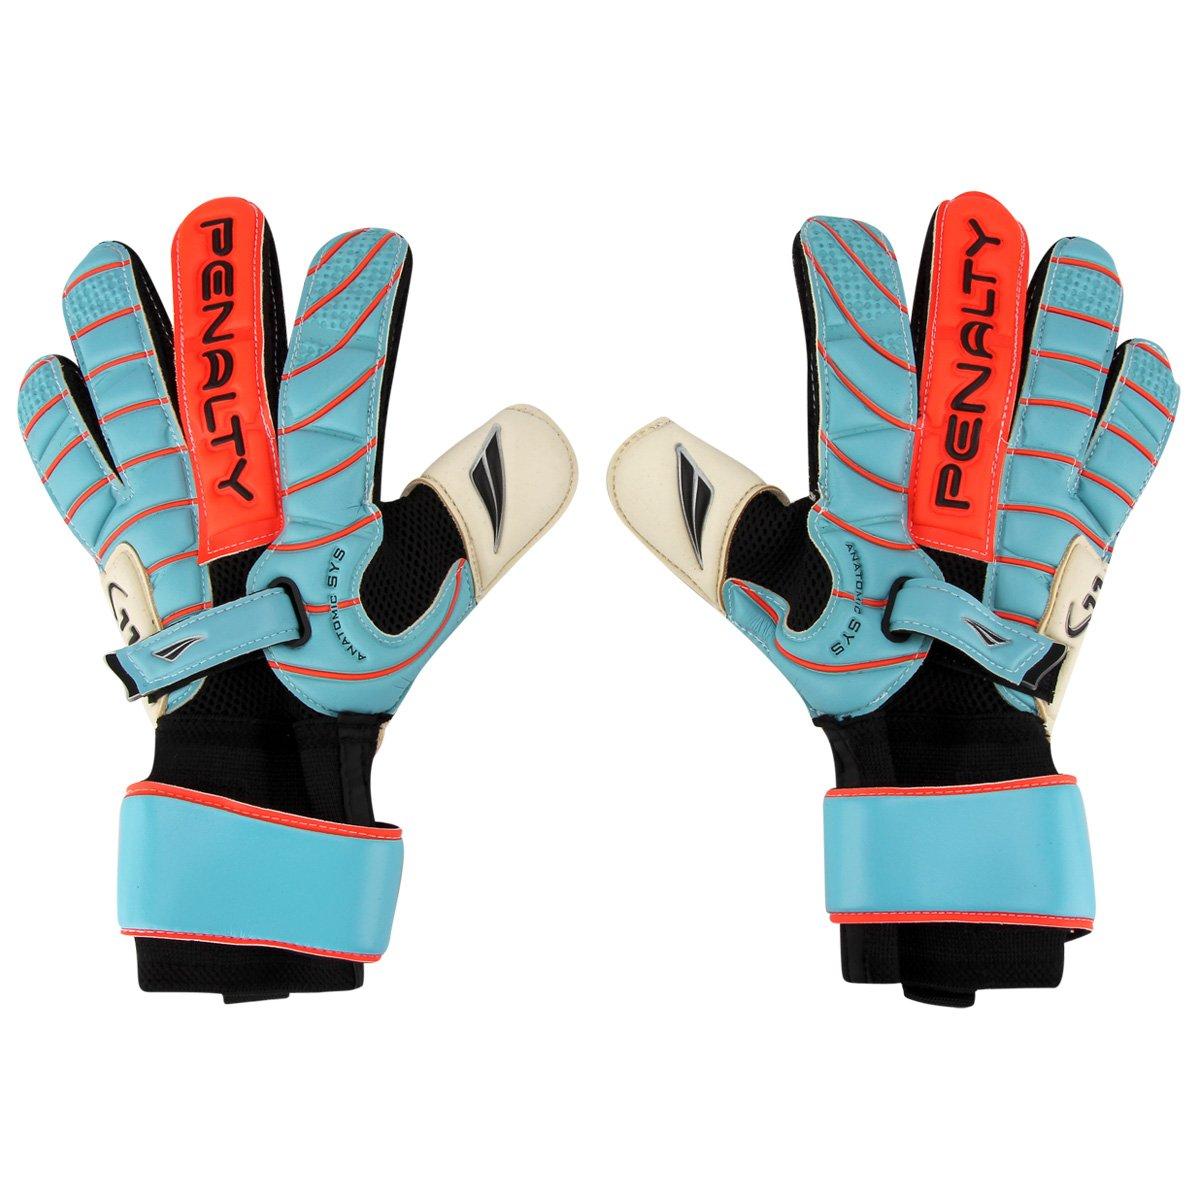 Luva Penalty S11 Pro 3 - Compre Agora  e7ed98c08a82c